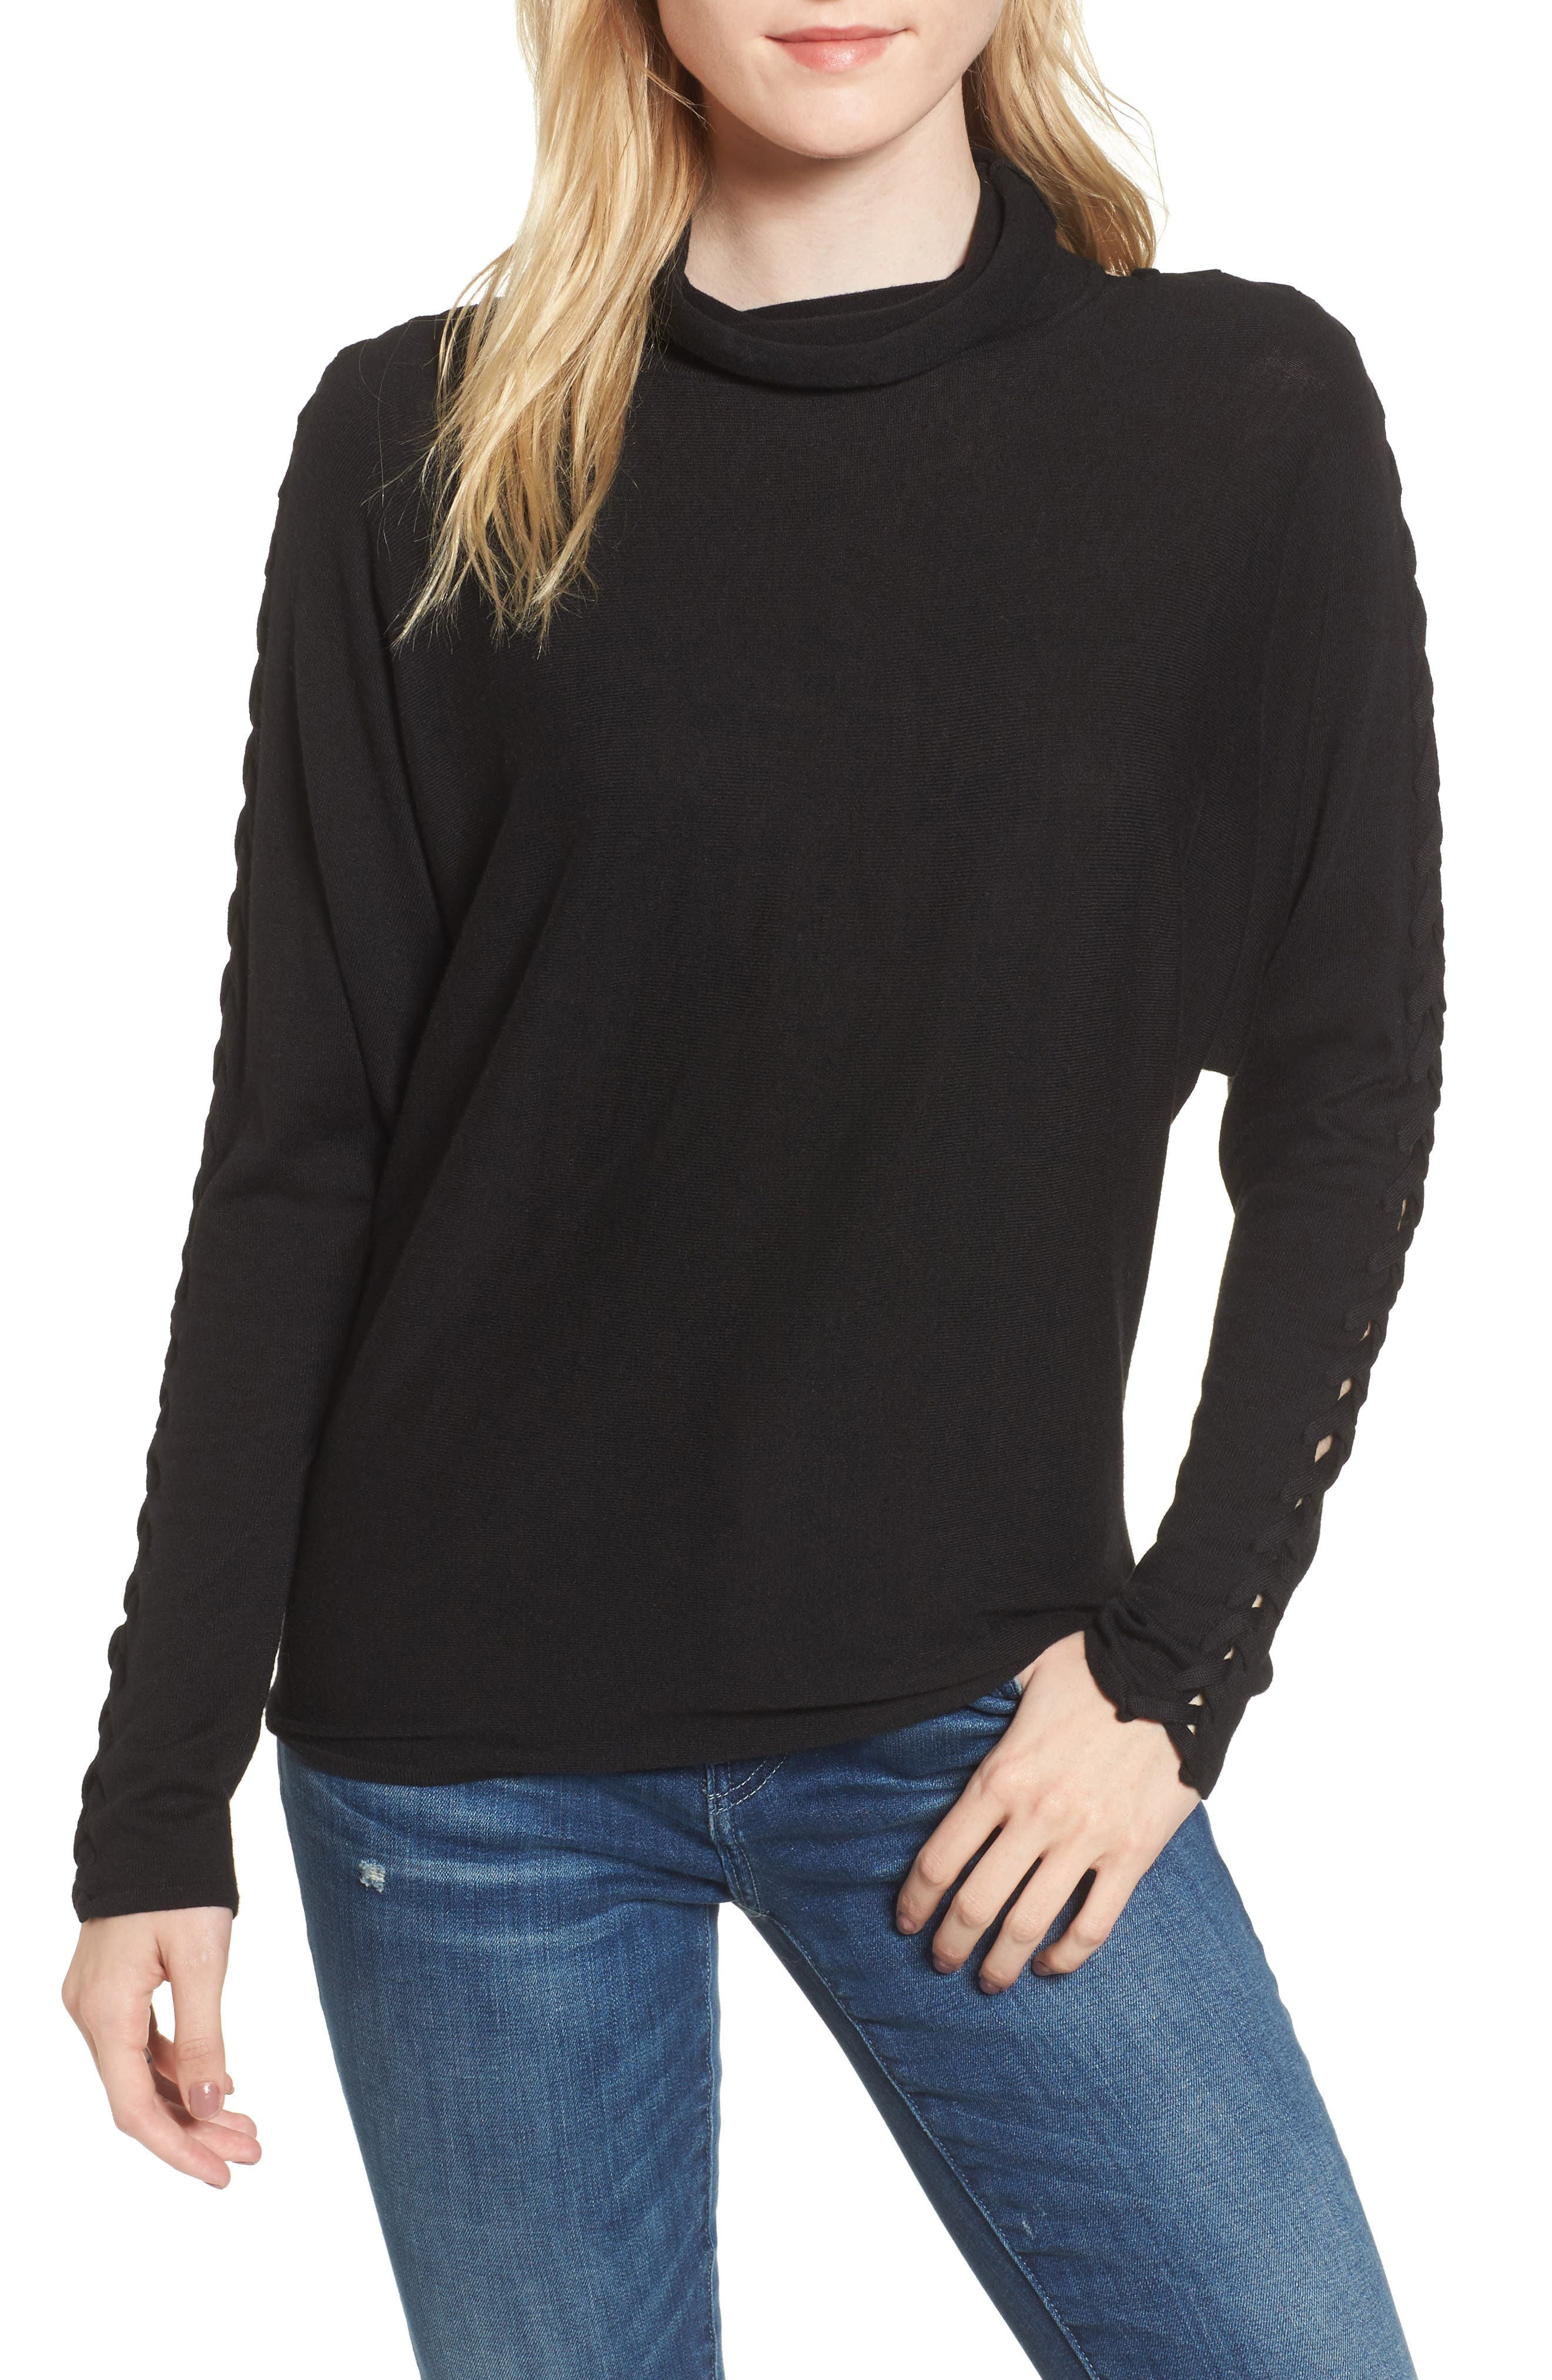 Victoire Turtleneck Sweater,                         Main,                         color, Black